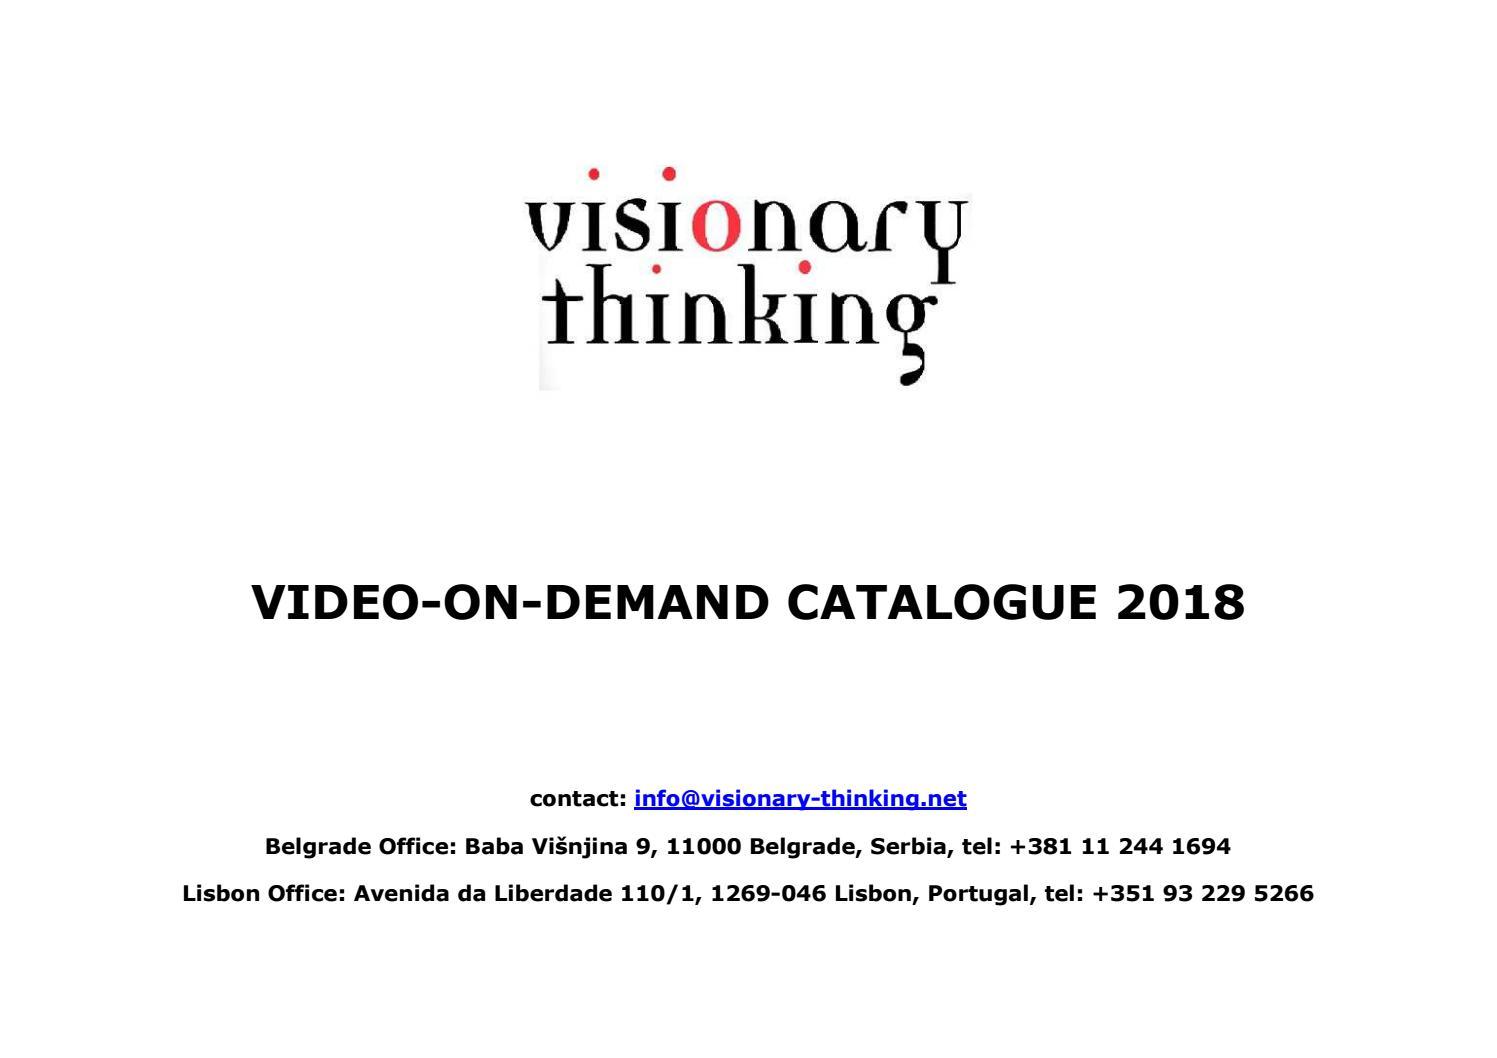 Visionary Thinking Catalogue VOD 2018 by Dragan Petrovic - issuu